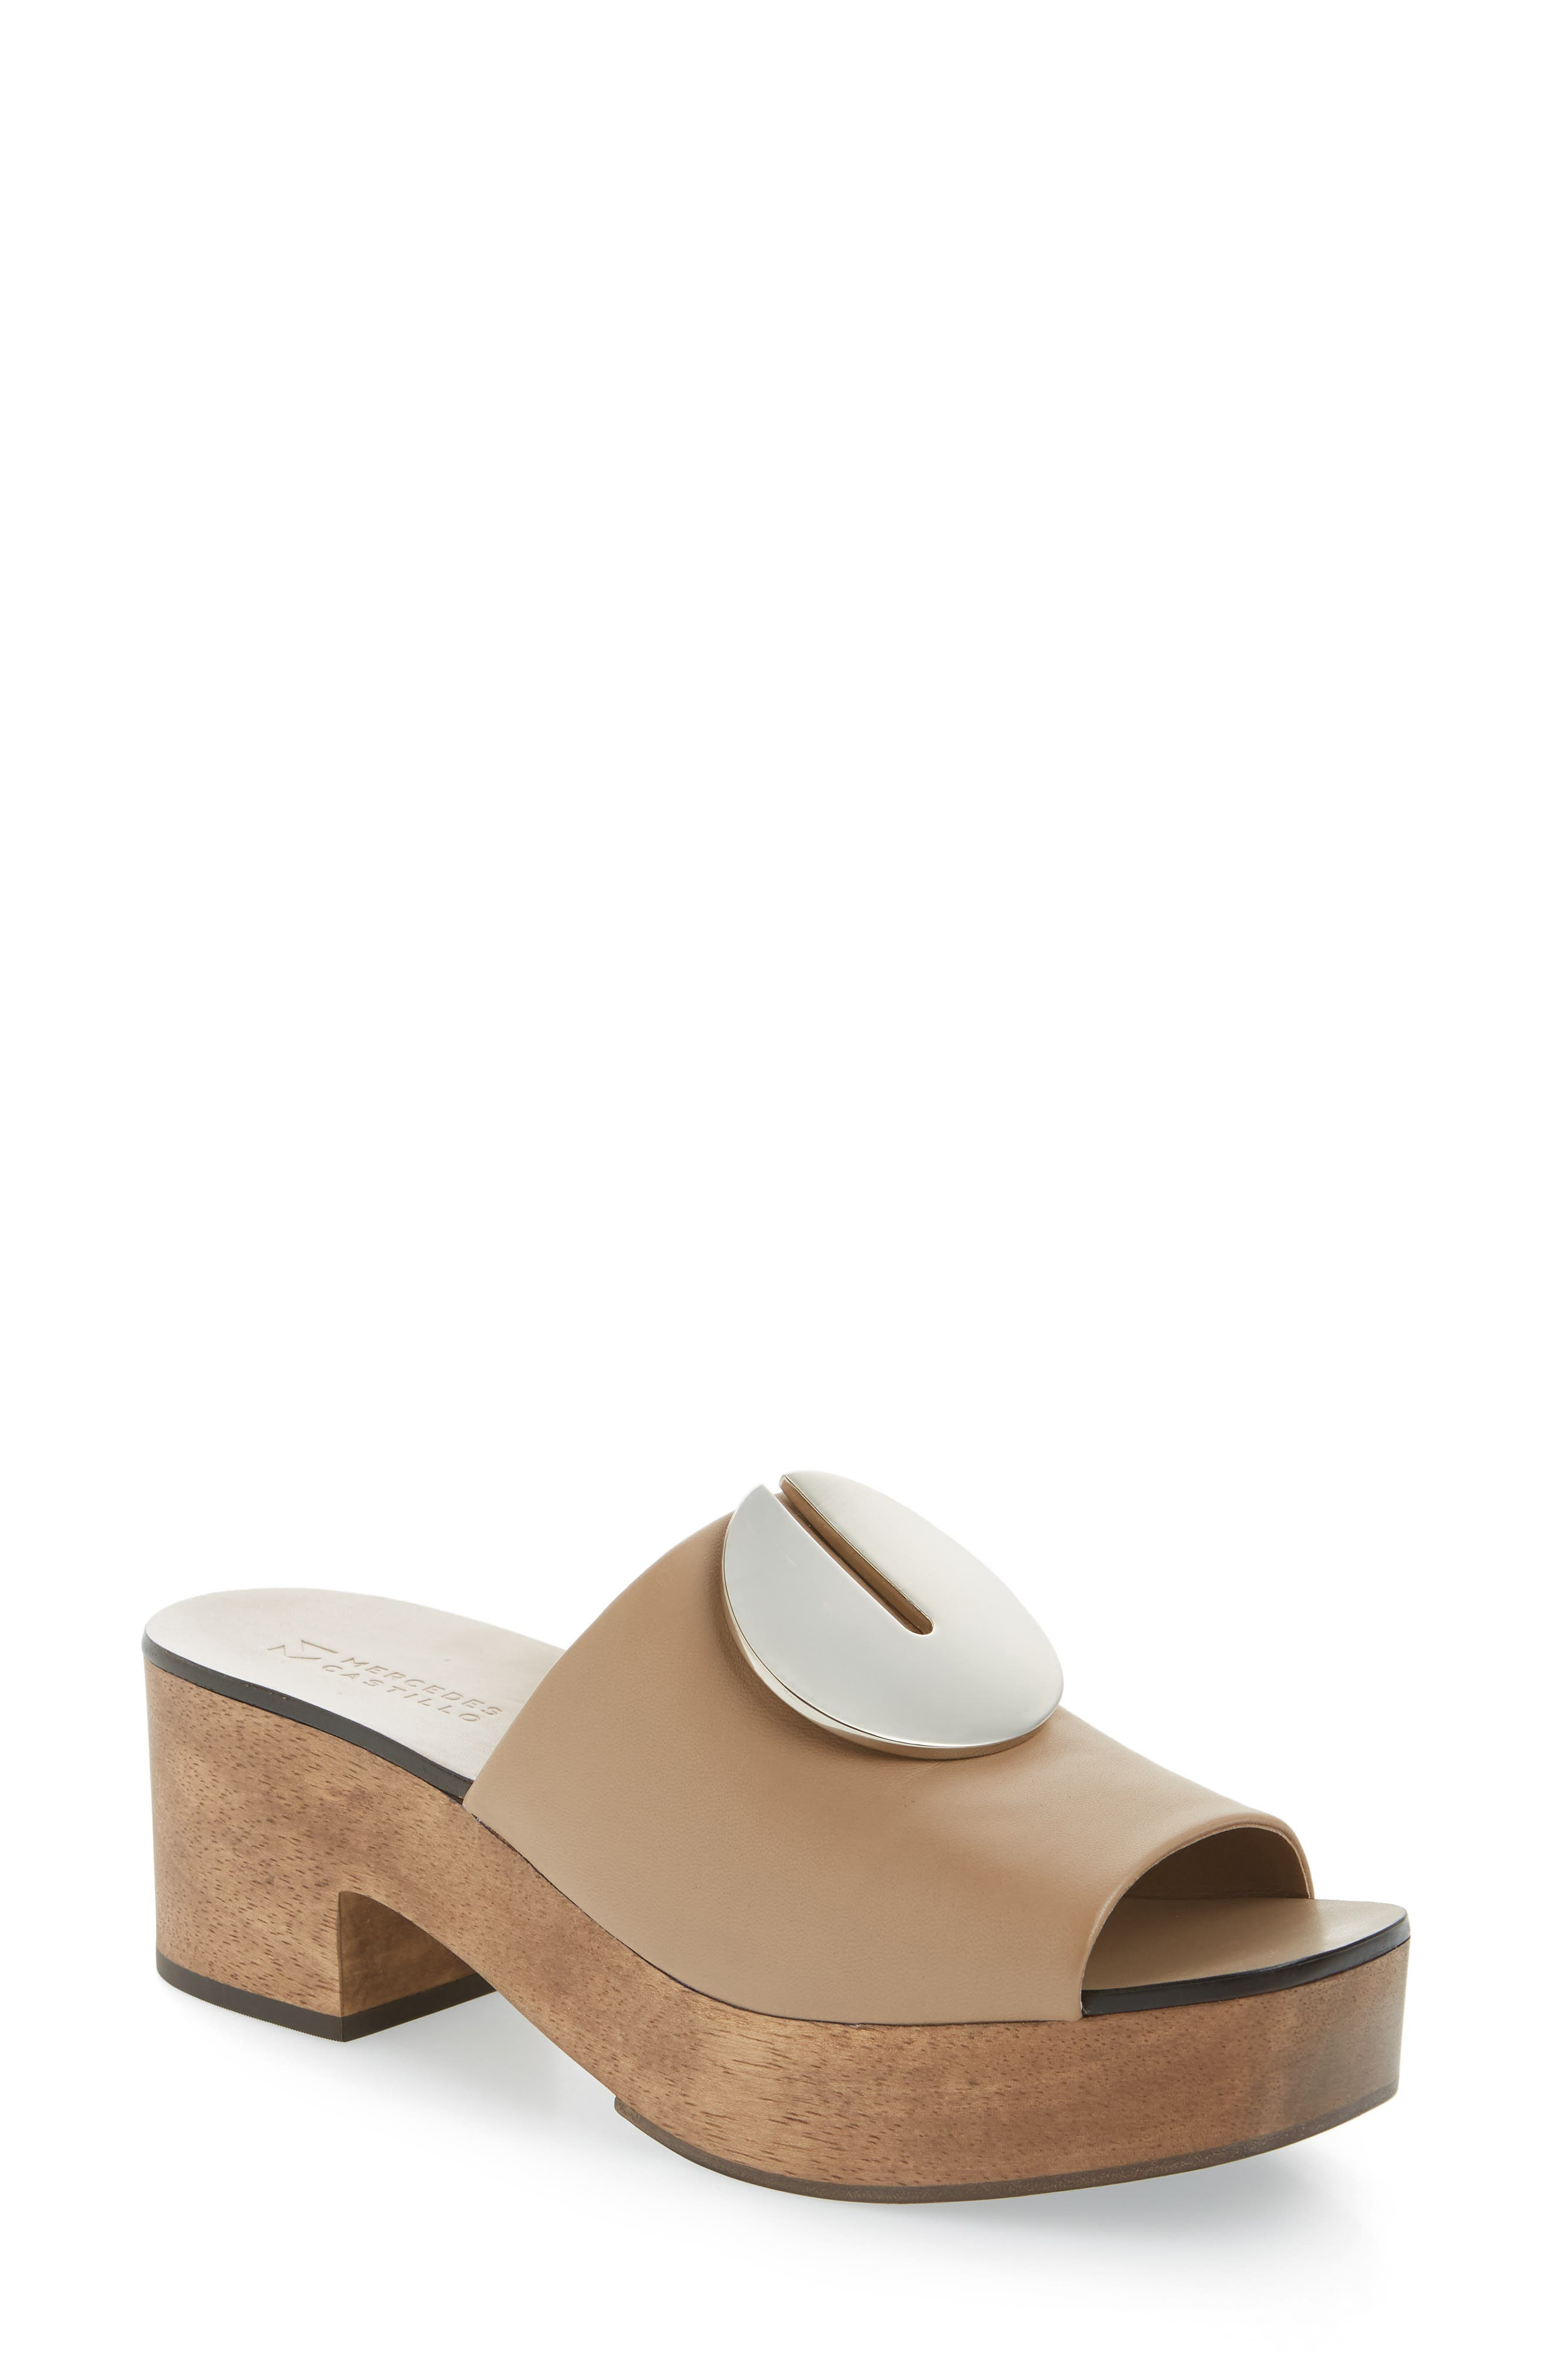 Kamilia Platform Sandal,                         Main,                         color,